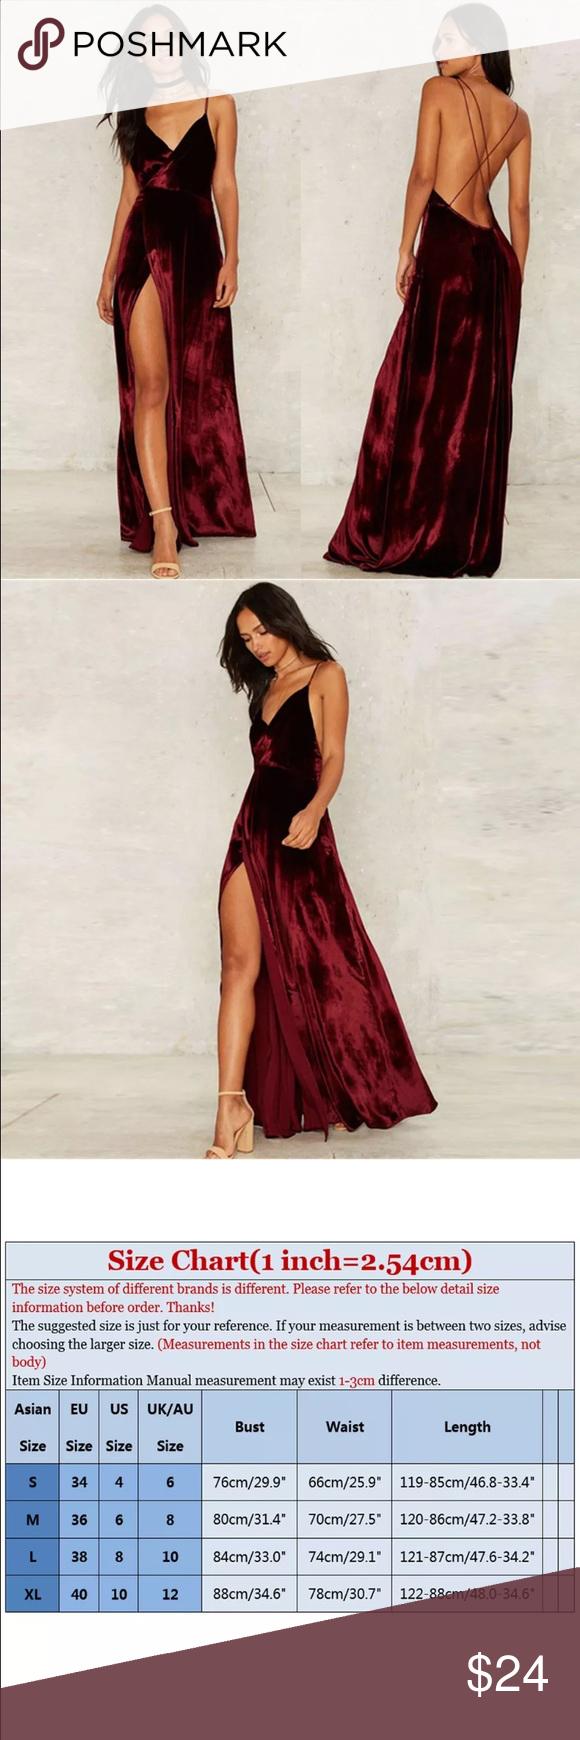 Hp nwot long backless dress backless dresses wine colored